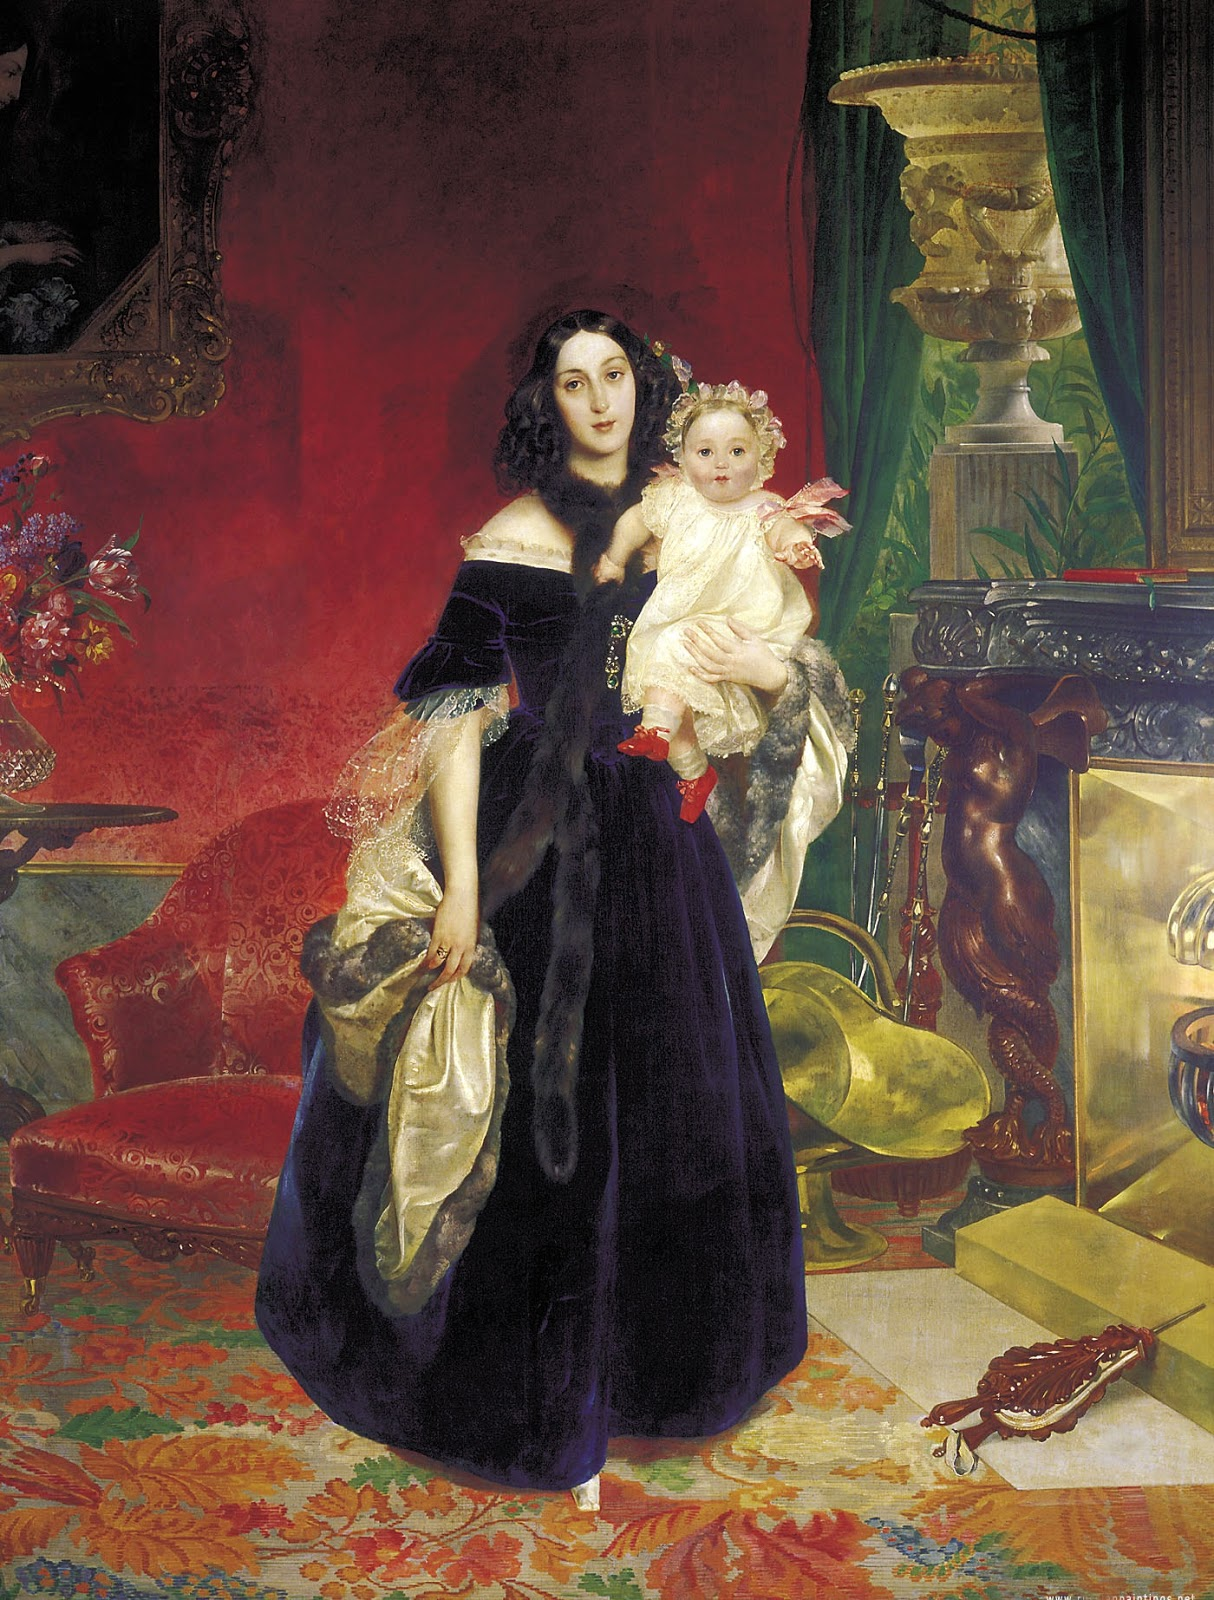 Karl   riullov  Portrait  of  the  Mariya  Arkadyevna   ek  with  Daughter C